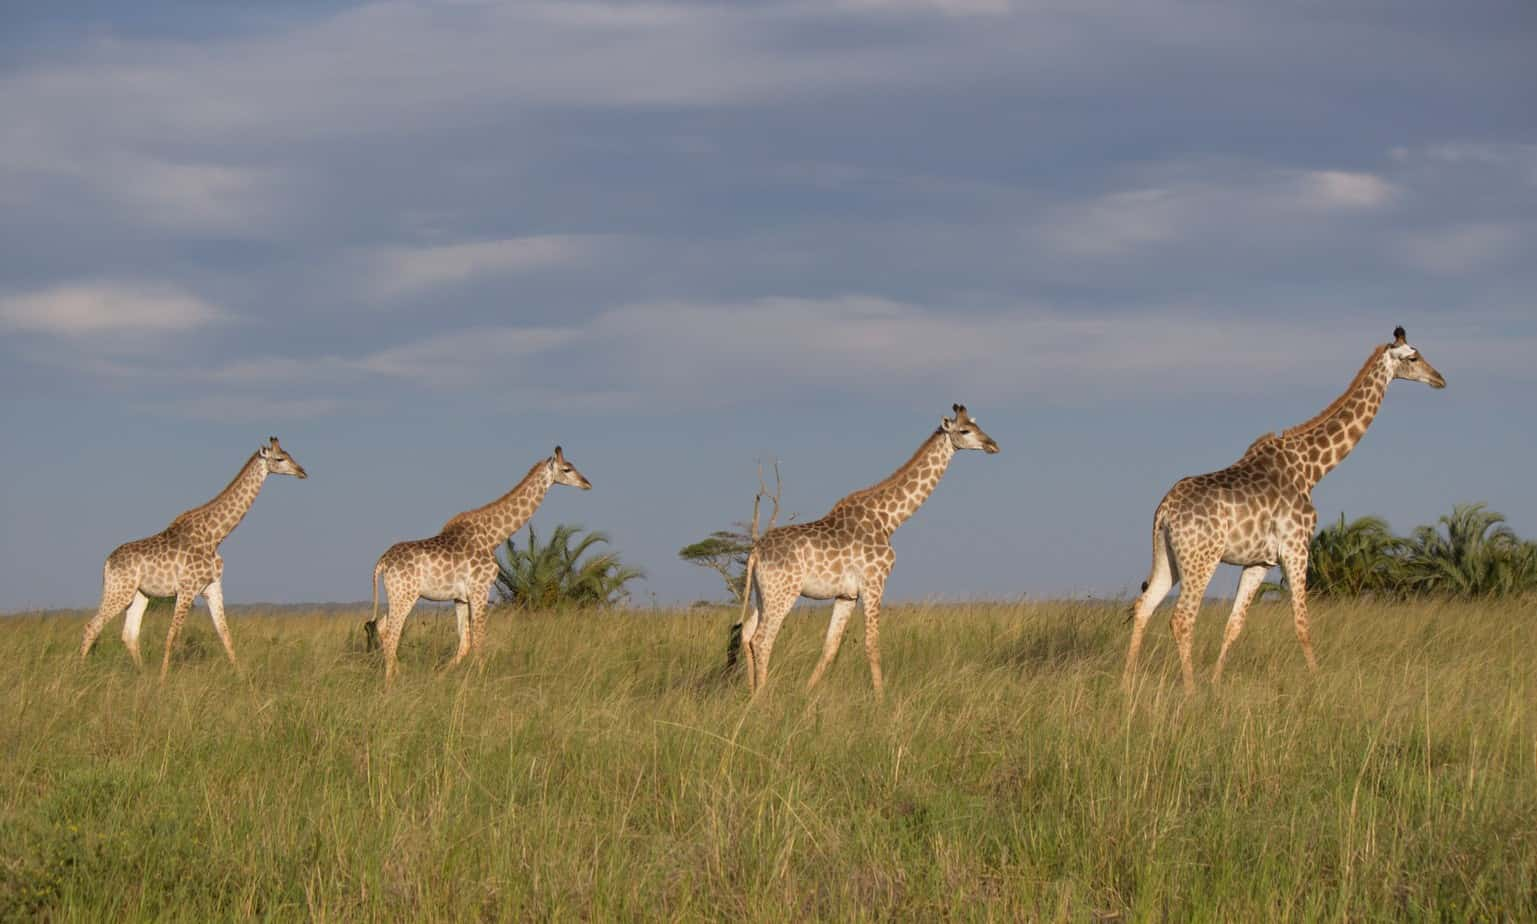 Sørafrikansk Sjiraff @ Western Shores - iSimangaliso Wetland Park, Sør-Afrika. Foto: Håvard Rosenlund